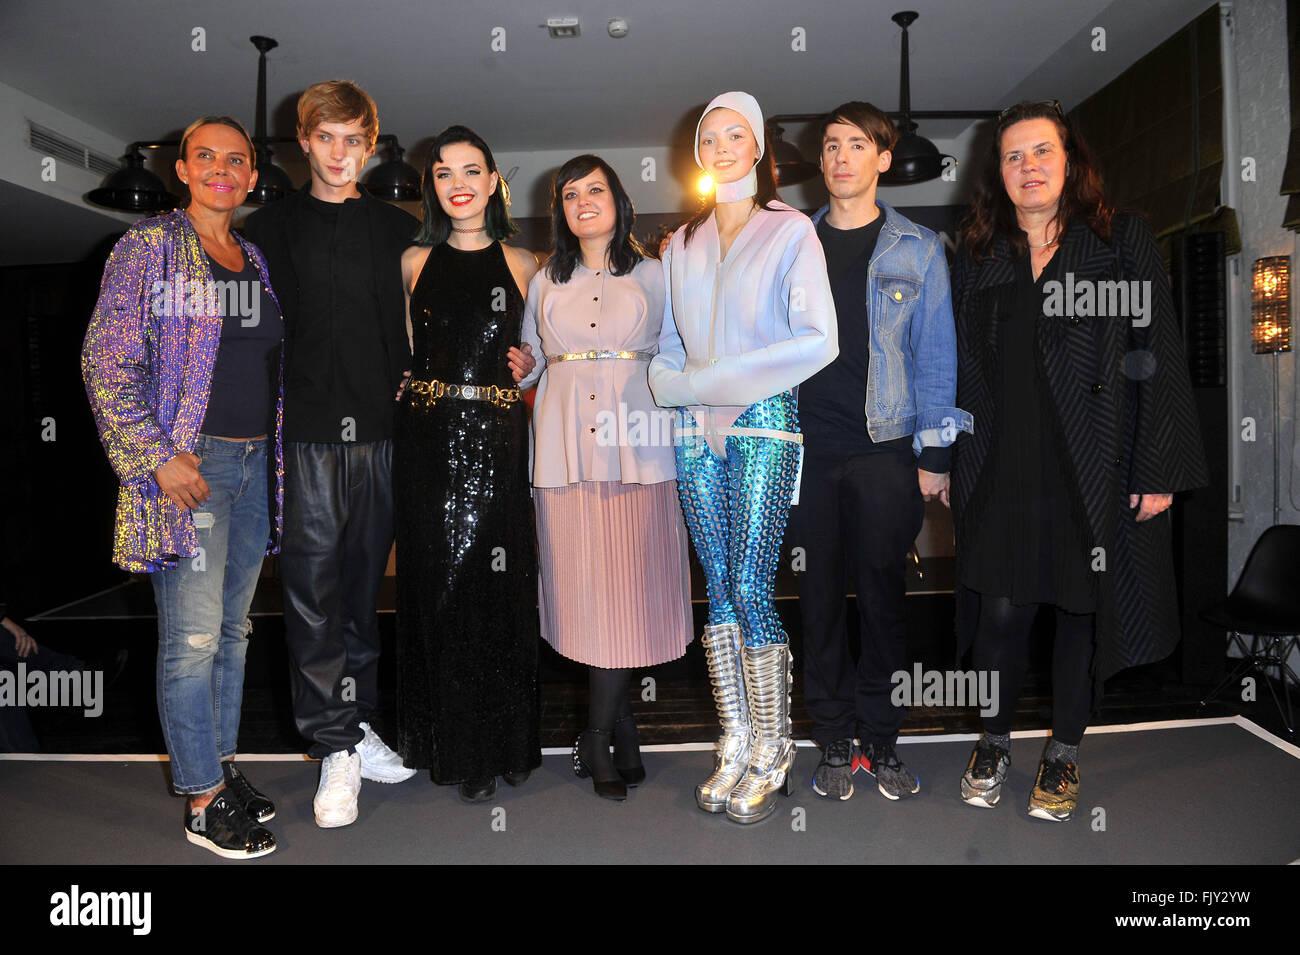 Zoolander No. 2 Fashion Award at Soho House  Featuring: Natascha Ochsenknecht, Paul Boche, Bonnie Strange, Vreni - Stock Image